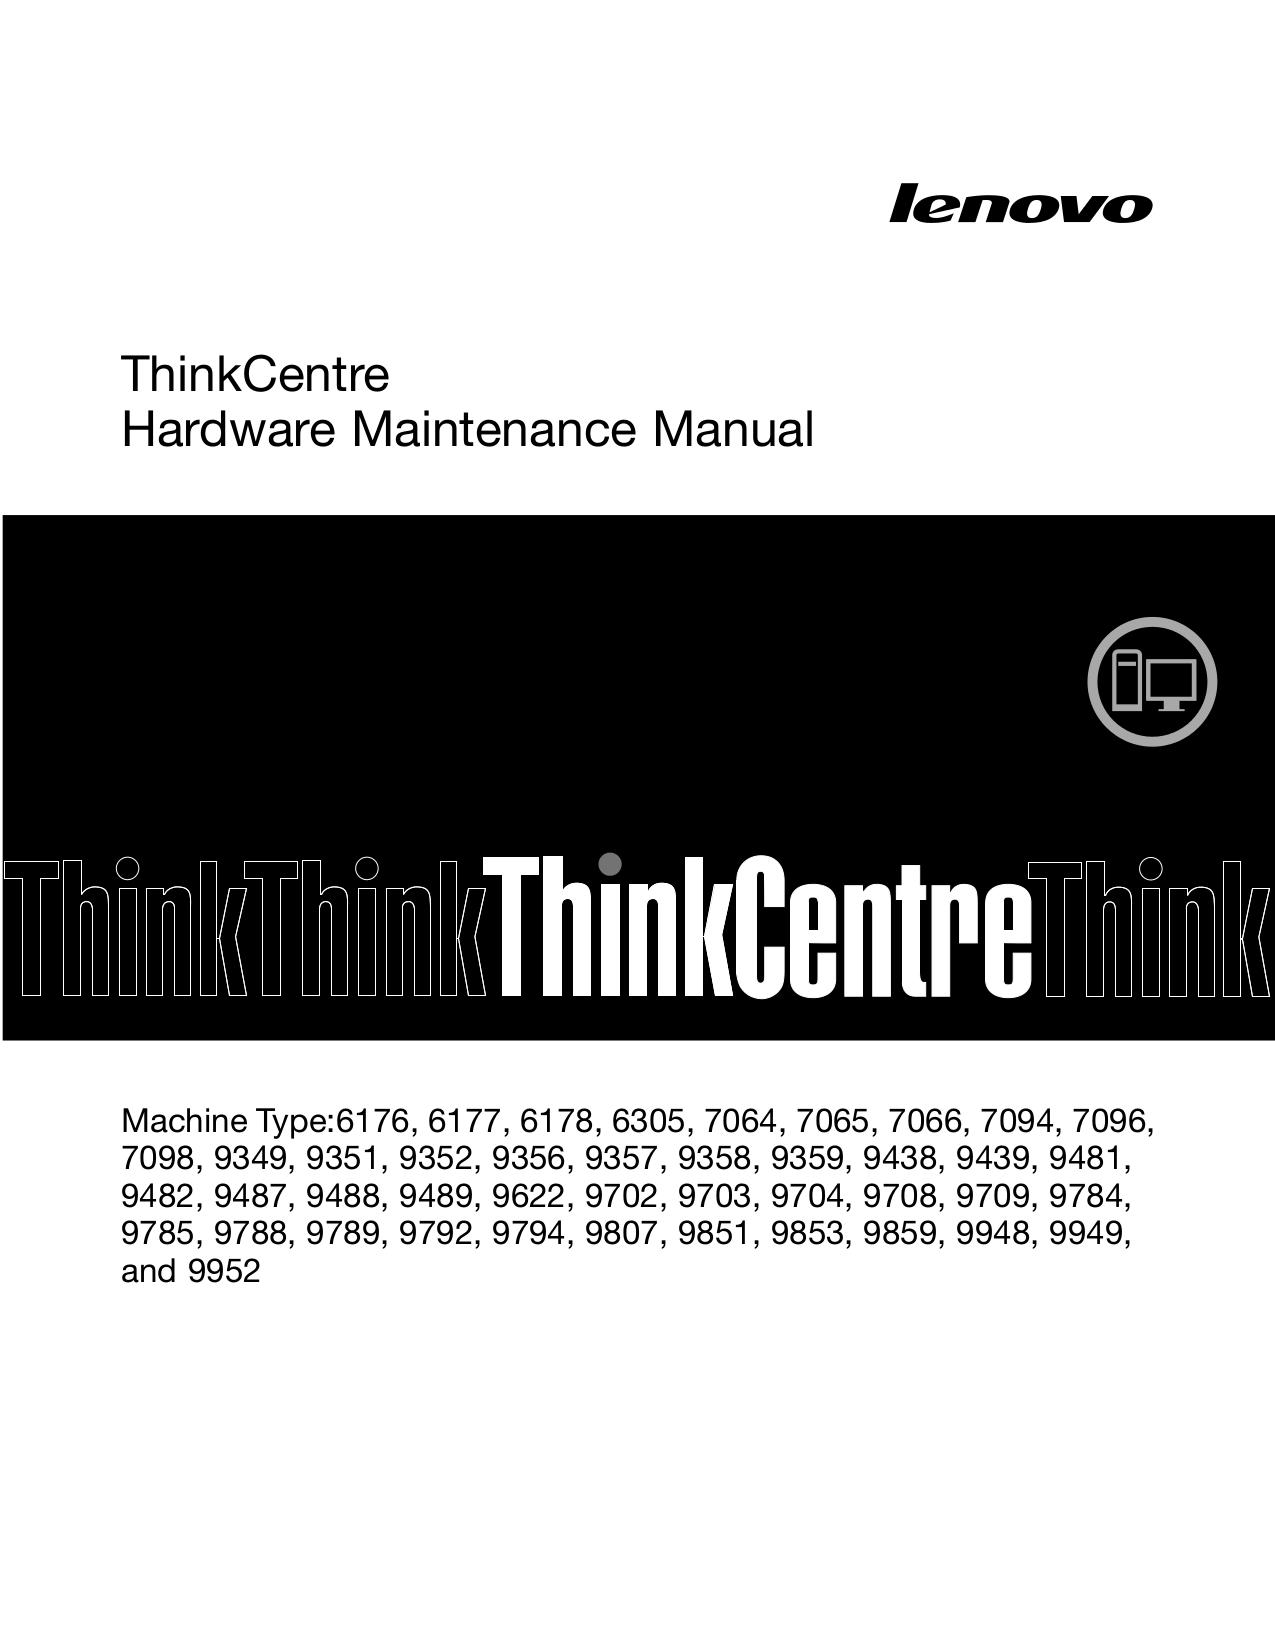 pdf for Lenovo Desktop ThinkCentre M57e 7098 manual